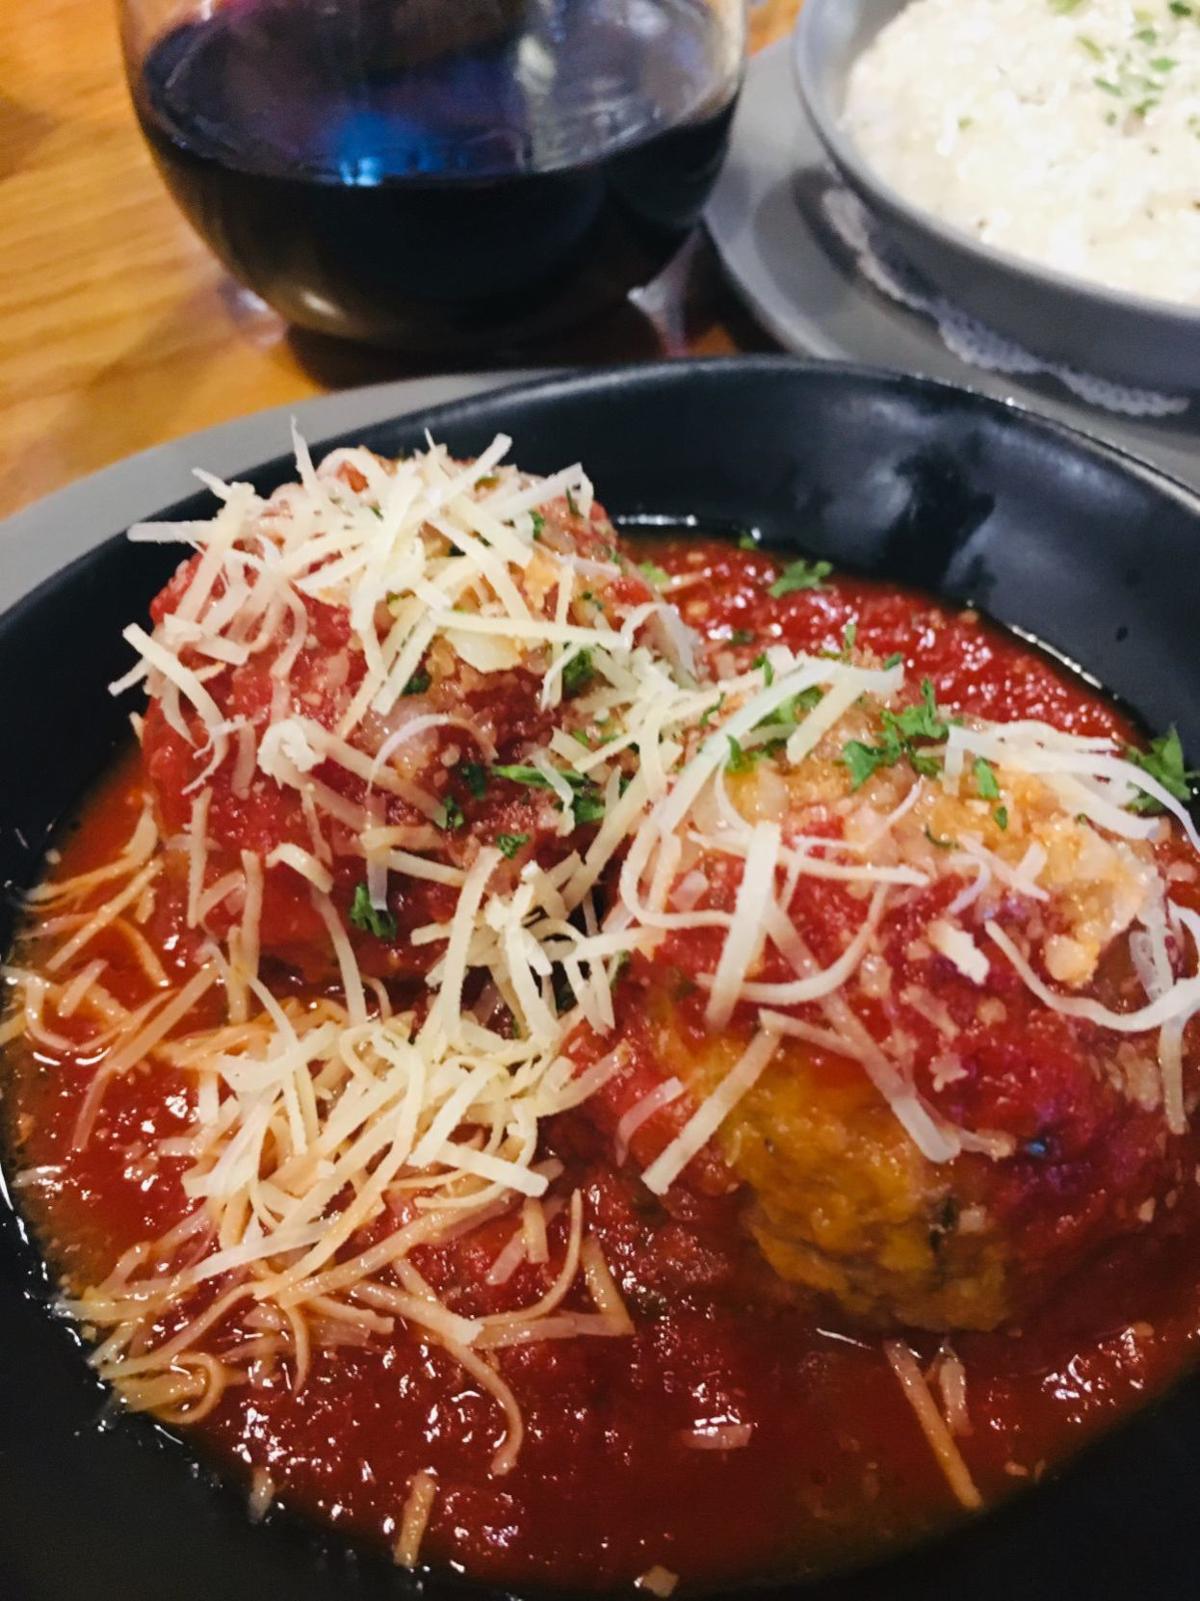 20190904-gm-food-guy-meatballs and choc torte.jpg